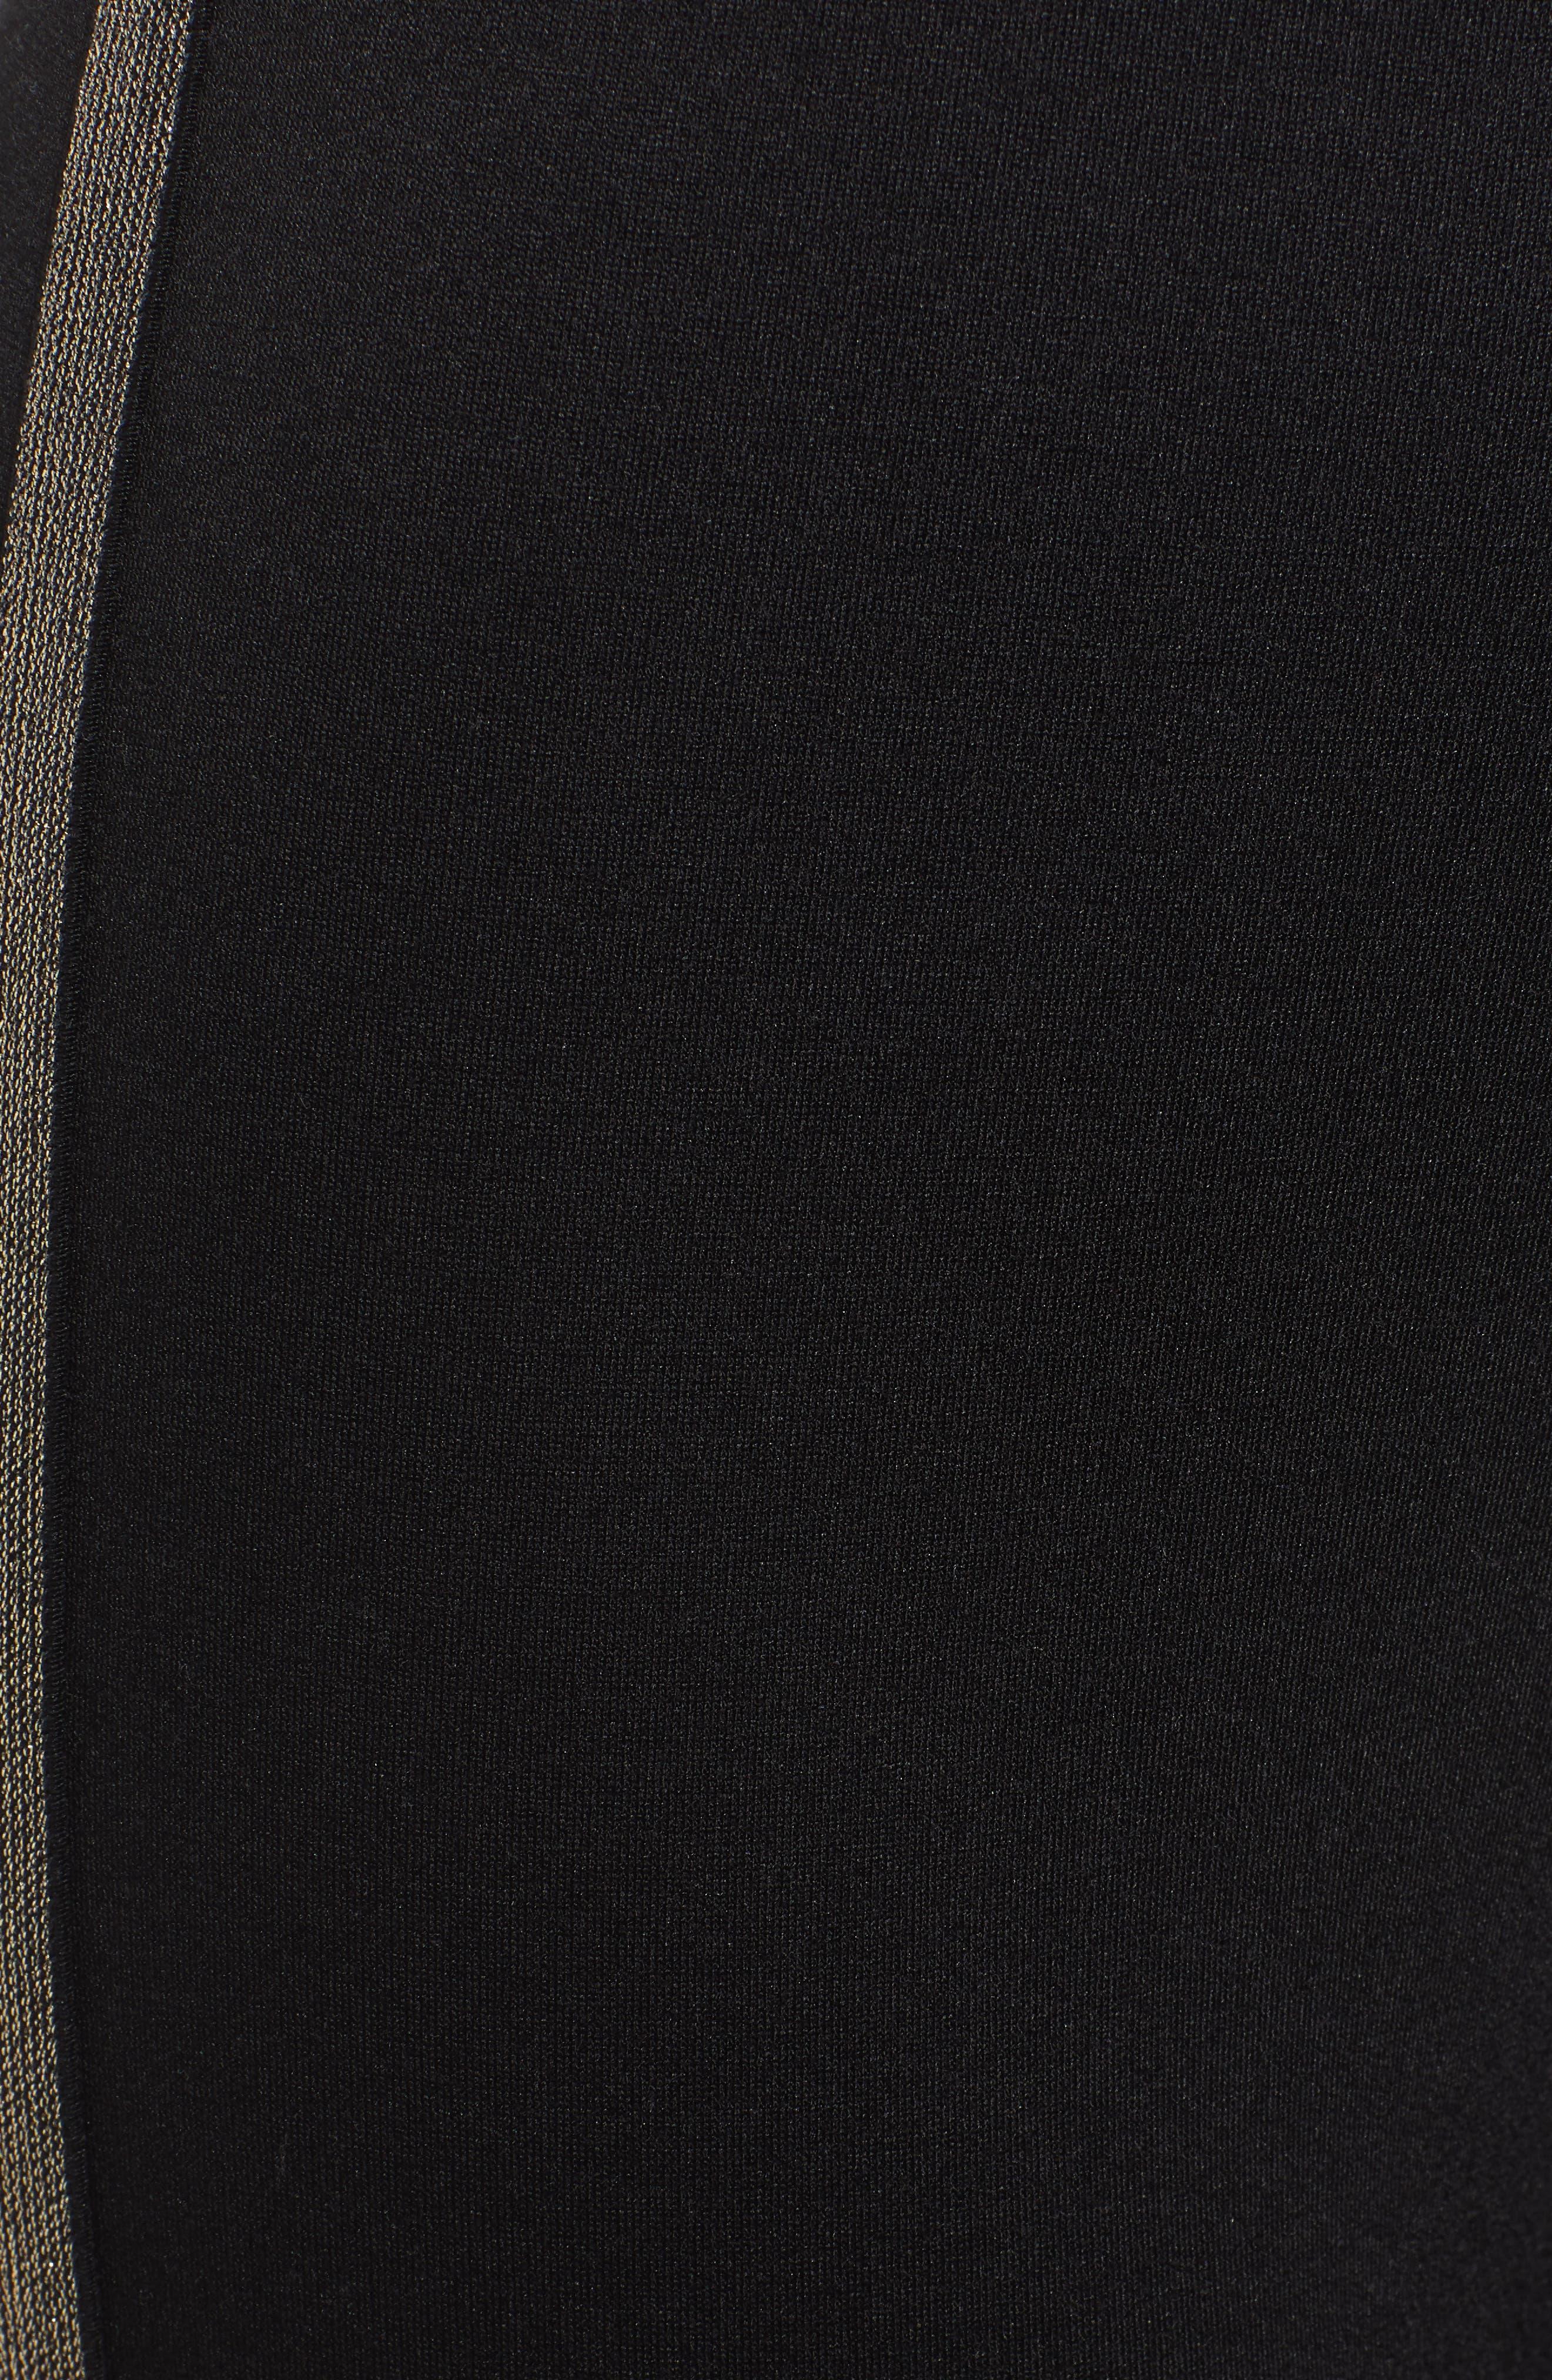 Metallic Tuxedo Stripe Ponte Leggings,                             Alternate thumbnail 6, color,                             005